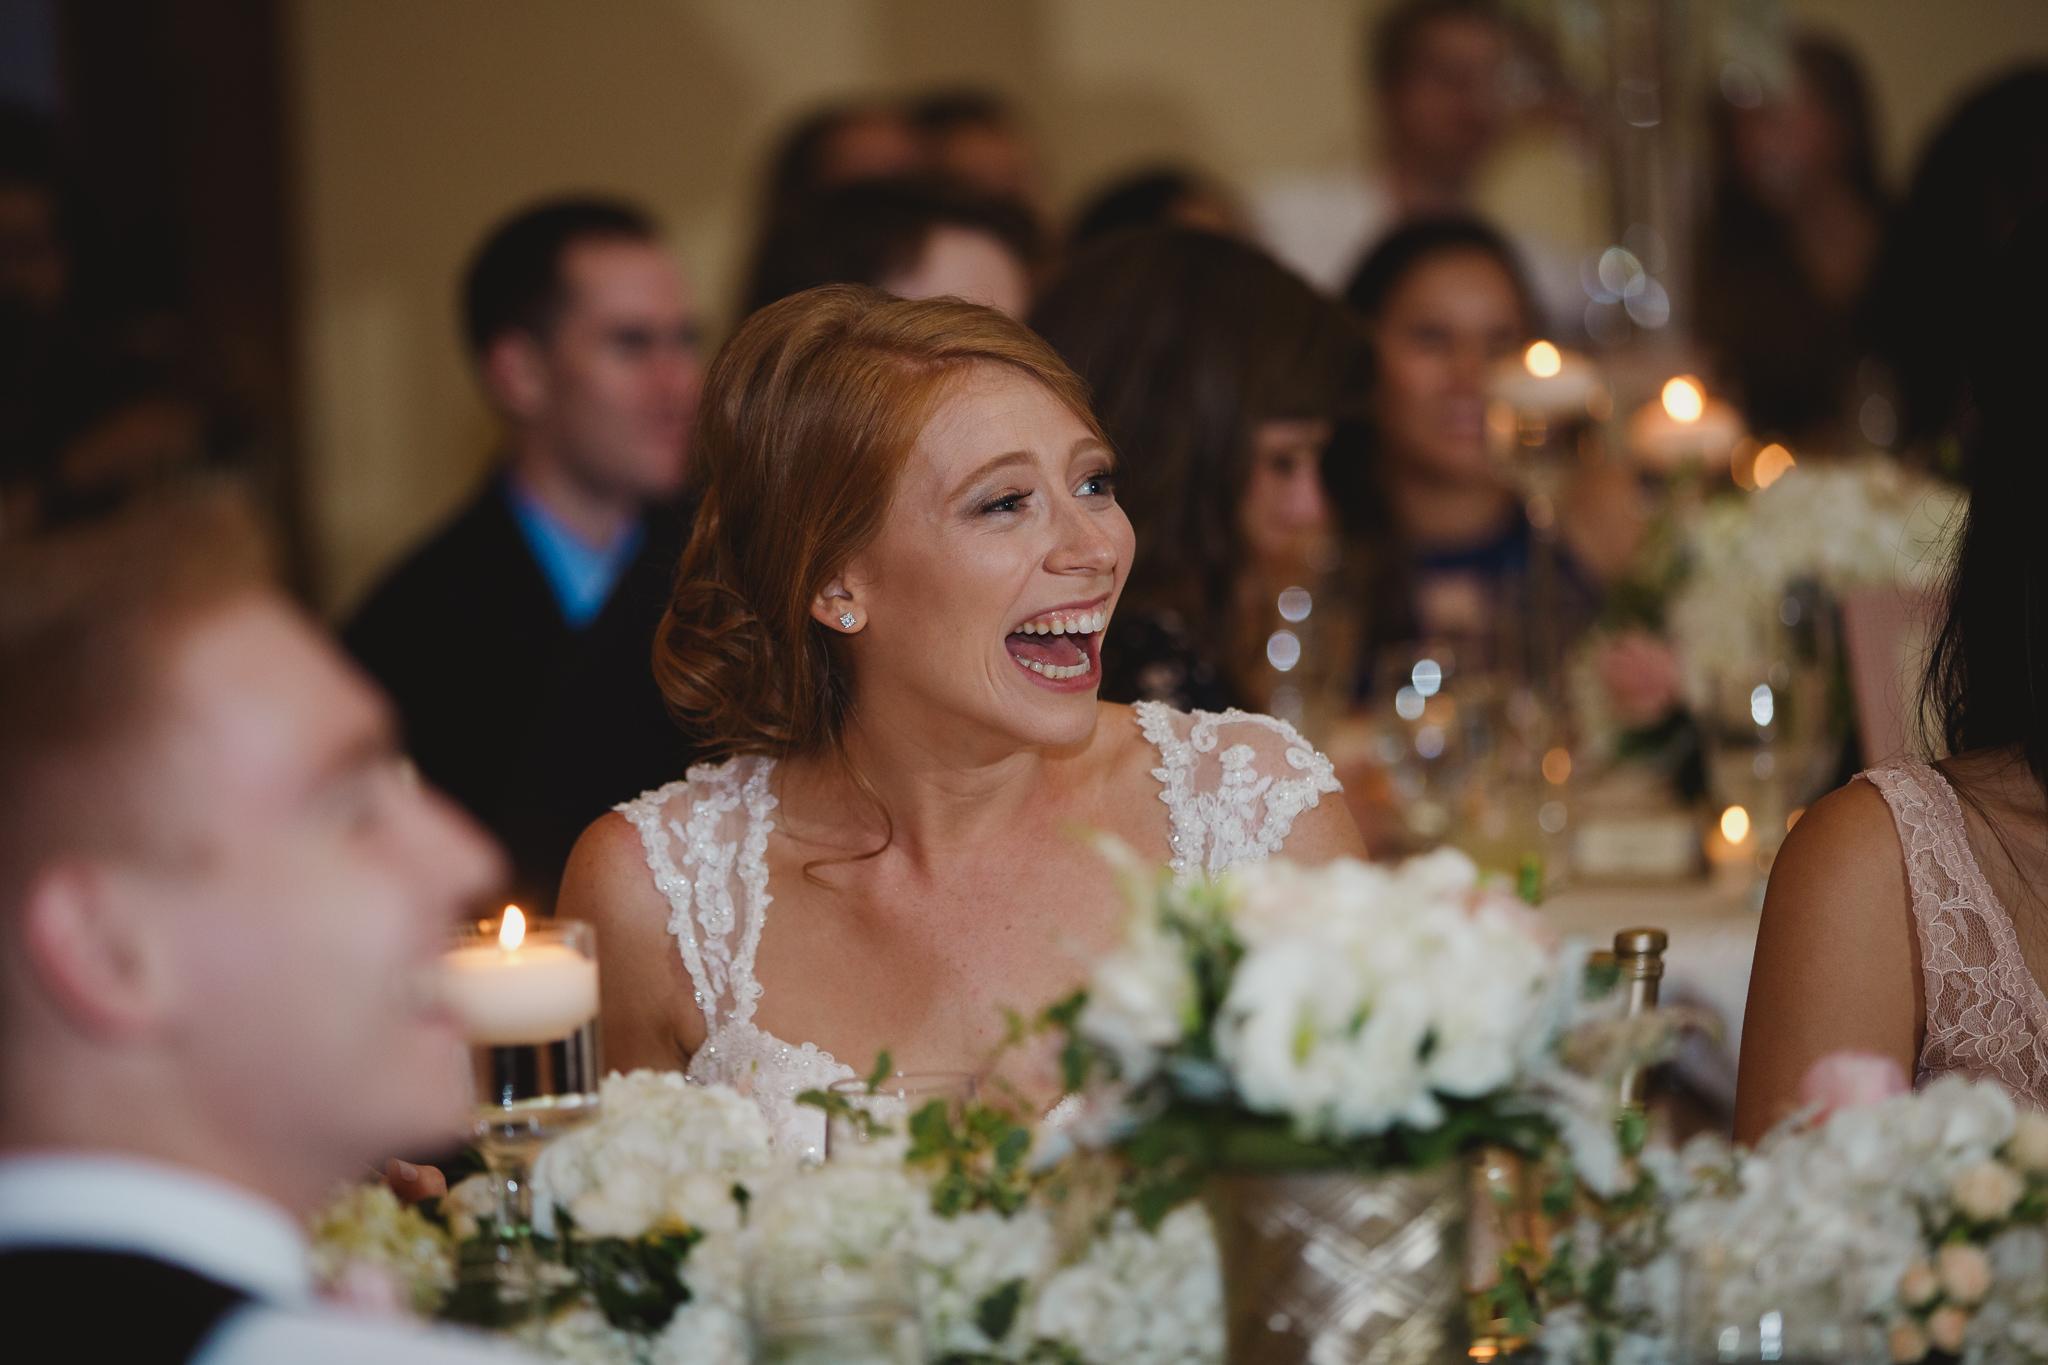 Michael and Kelly - the ashton depot - wedding DFW - wedding photographer- elizalde photography (102 of 150).jpg